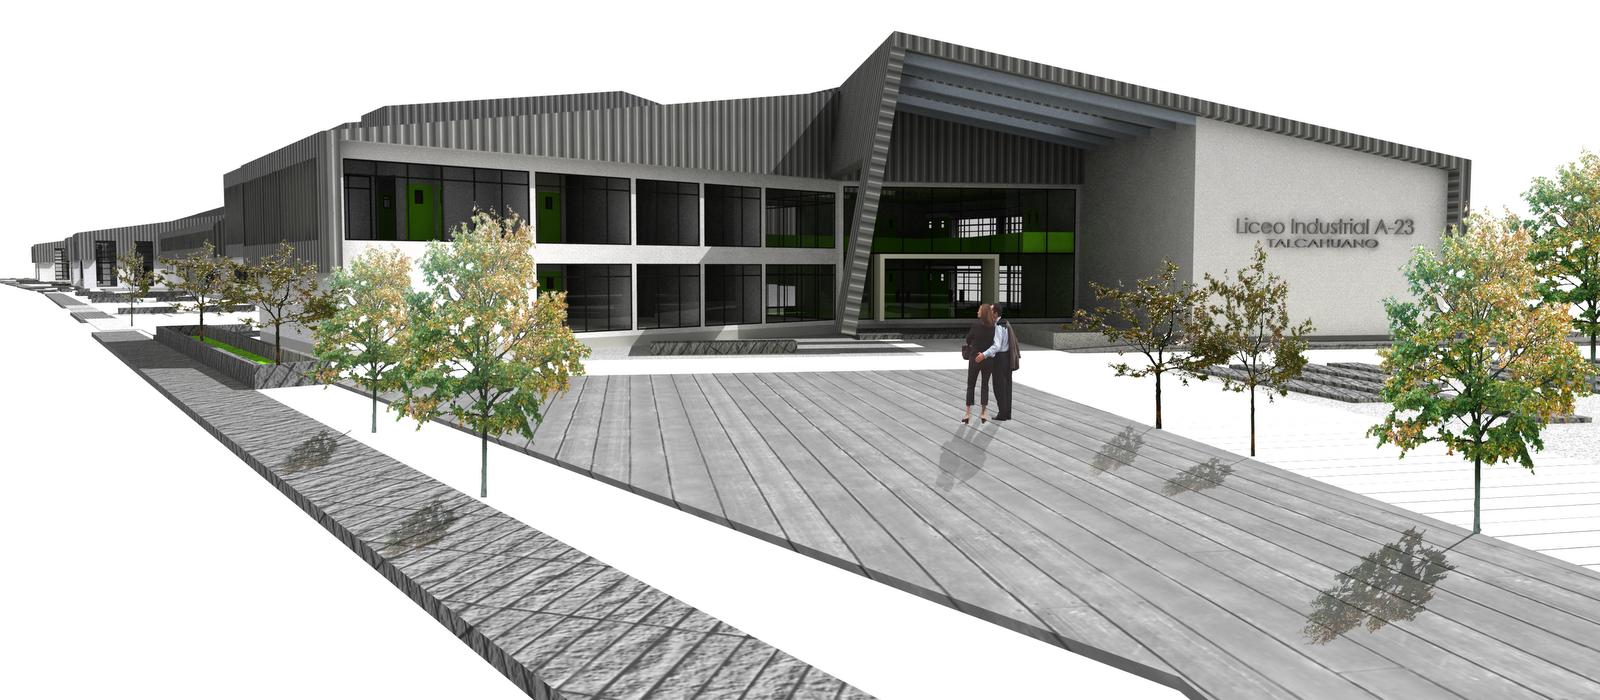 Ps arquitectura 3d proyecto reconstrucci n propuesta for Accesos arquitectura